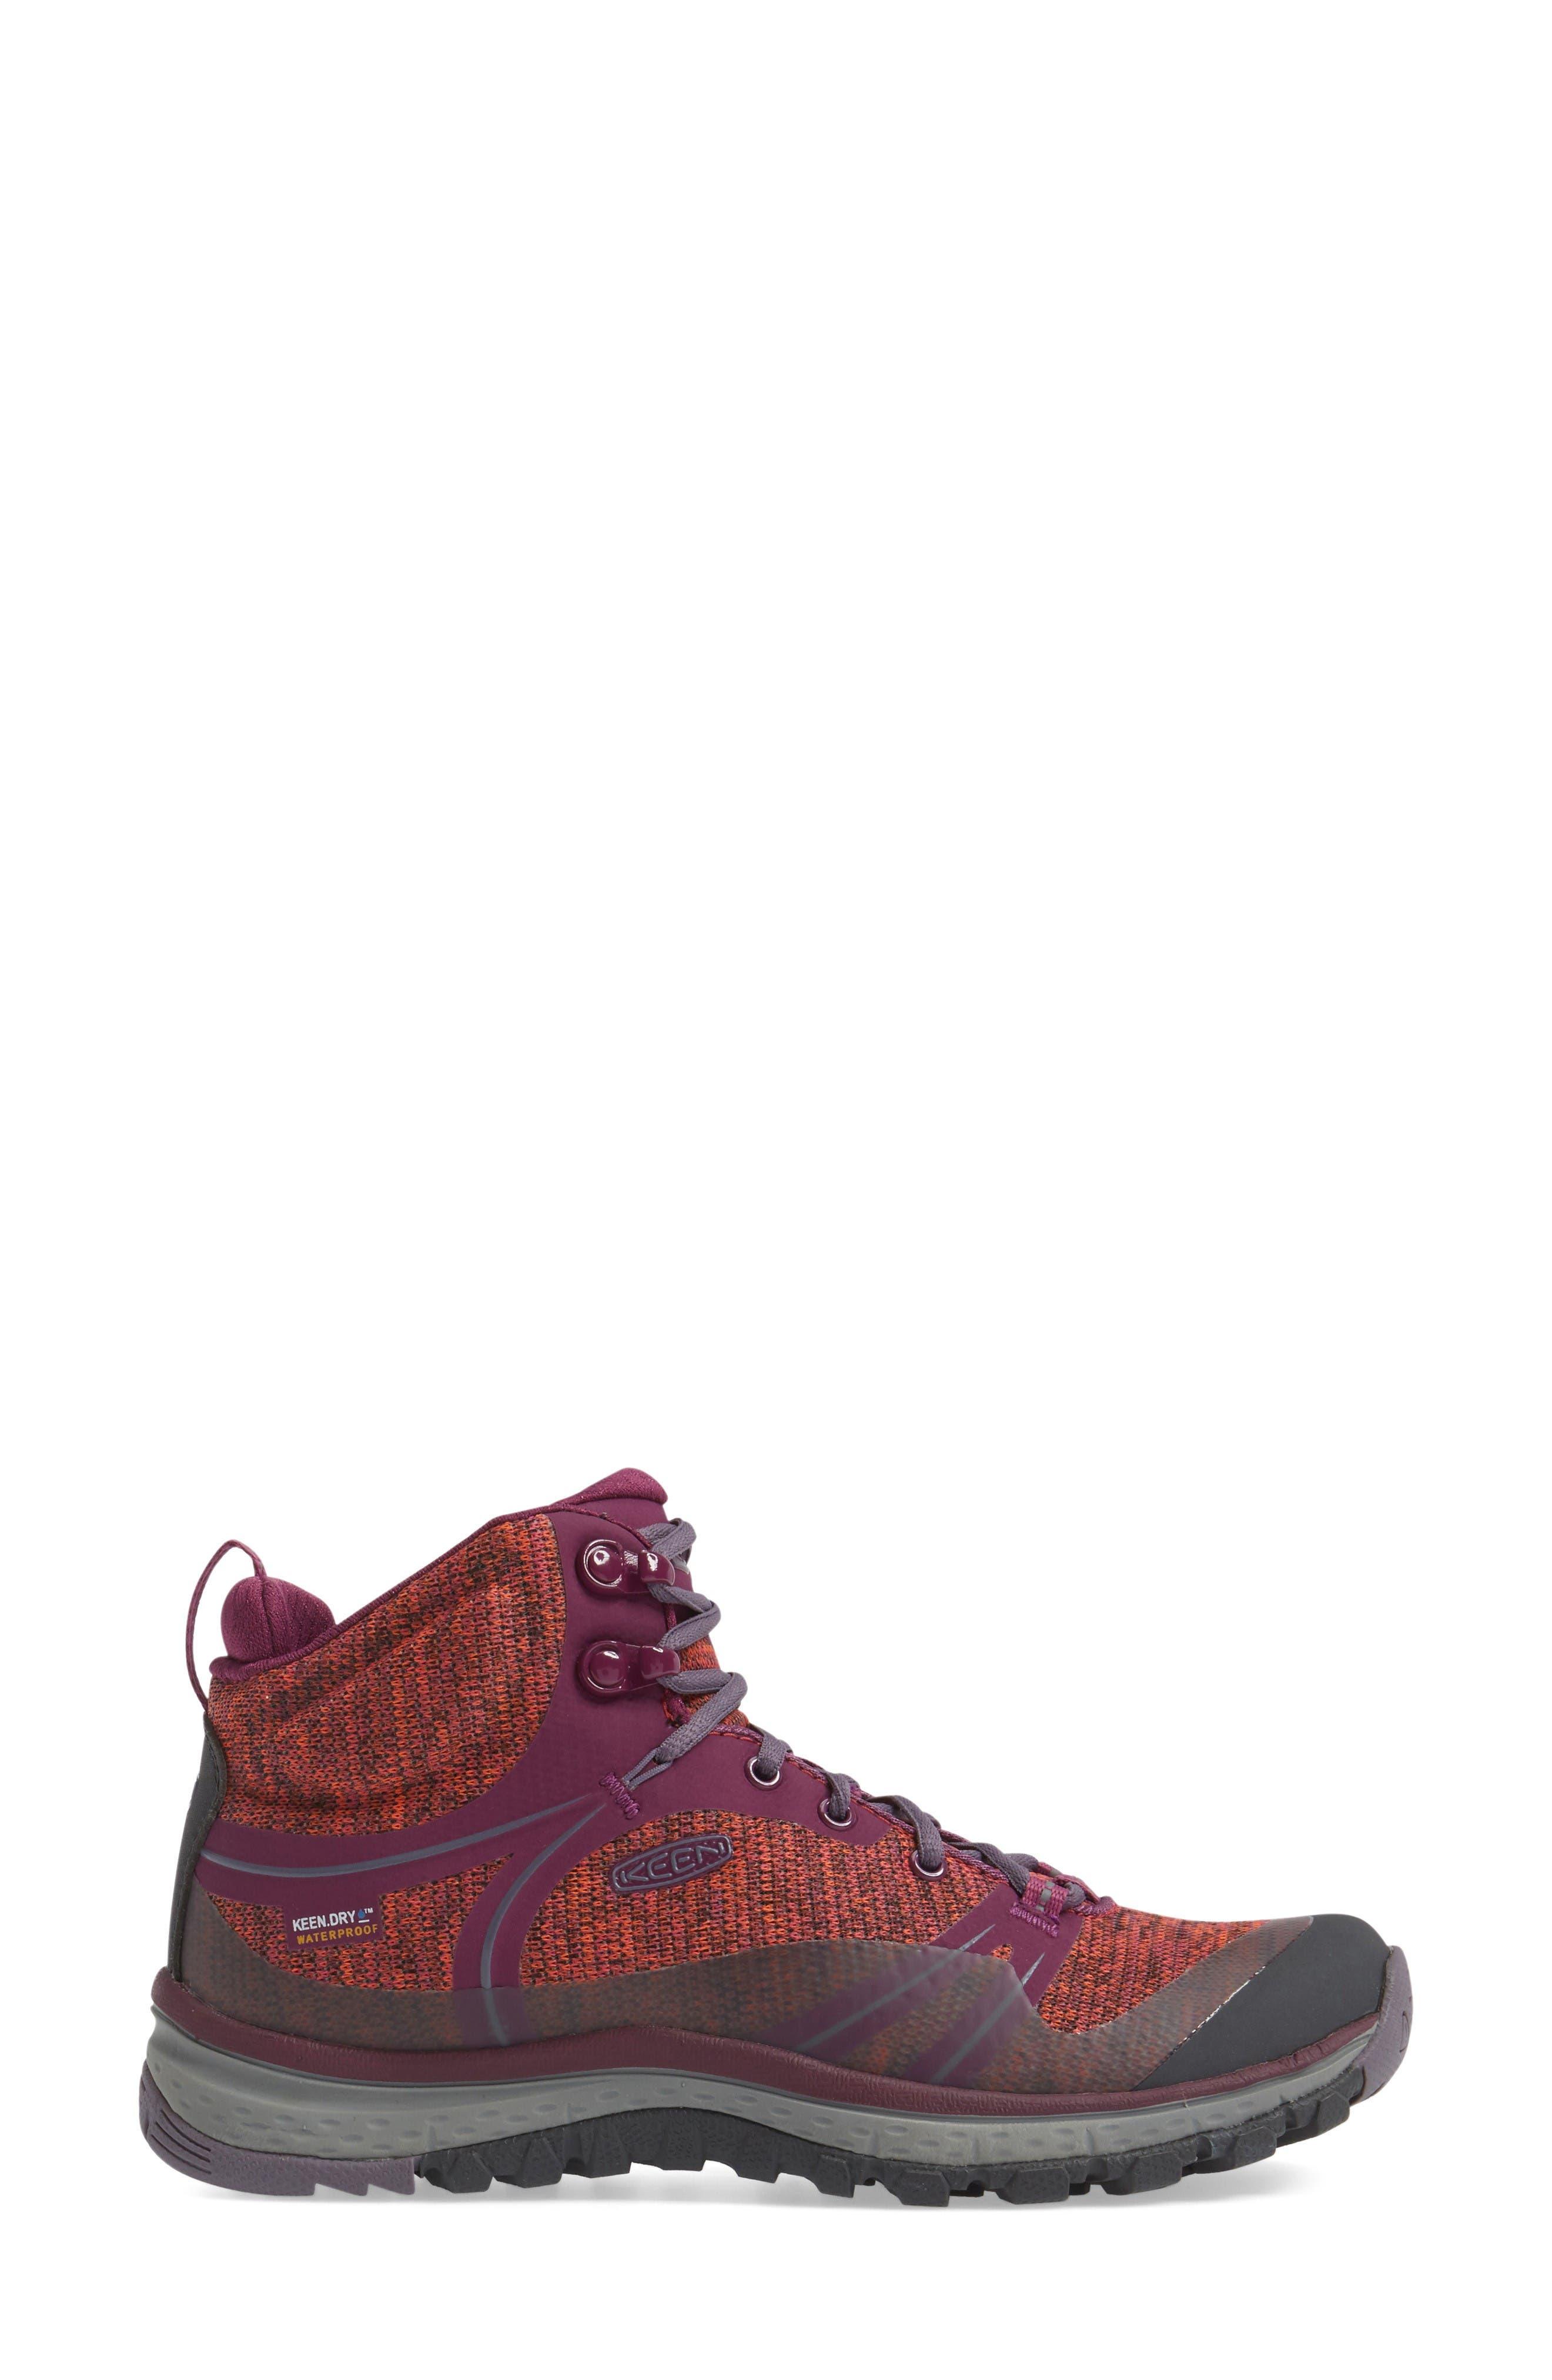 Alternate Image 3  - Keen Terradora Waterproof Hiking Boot (Women)